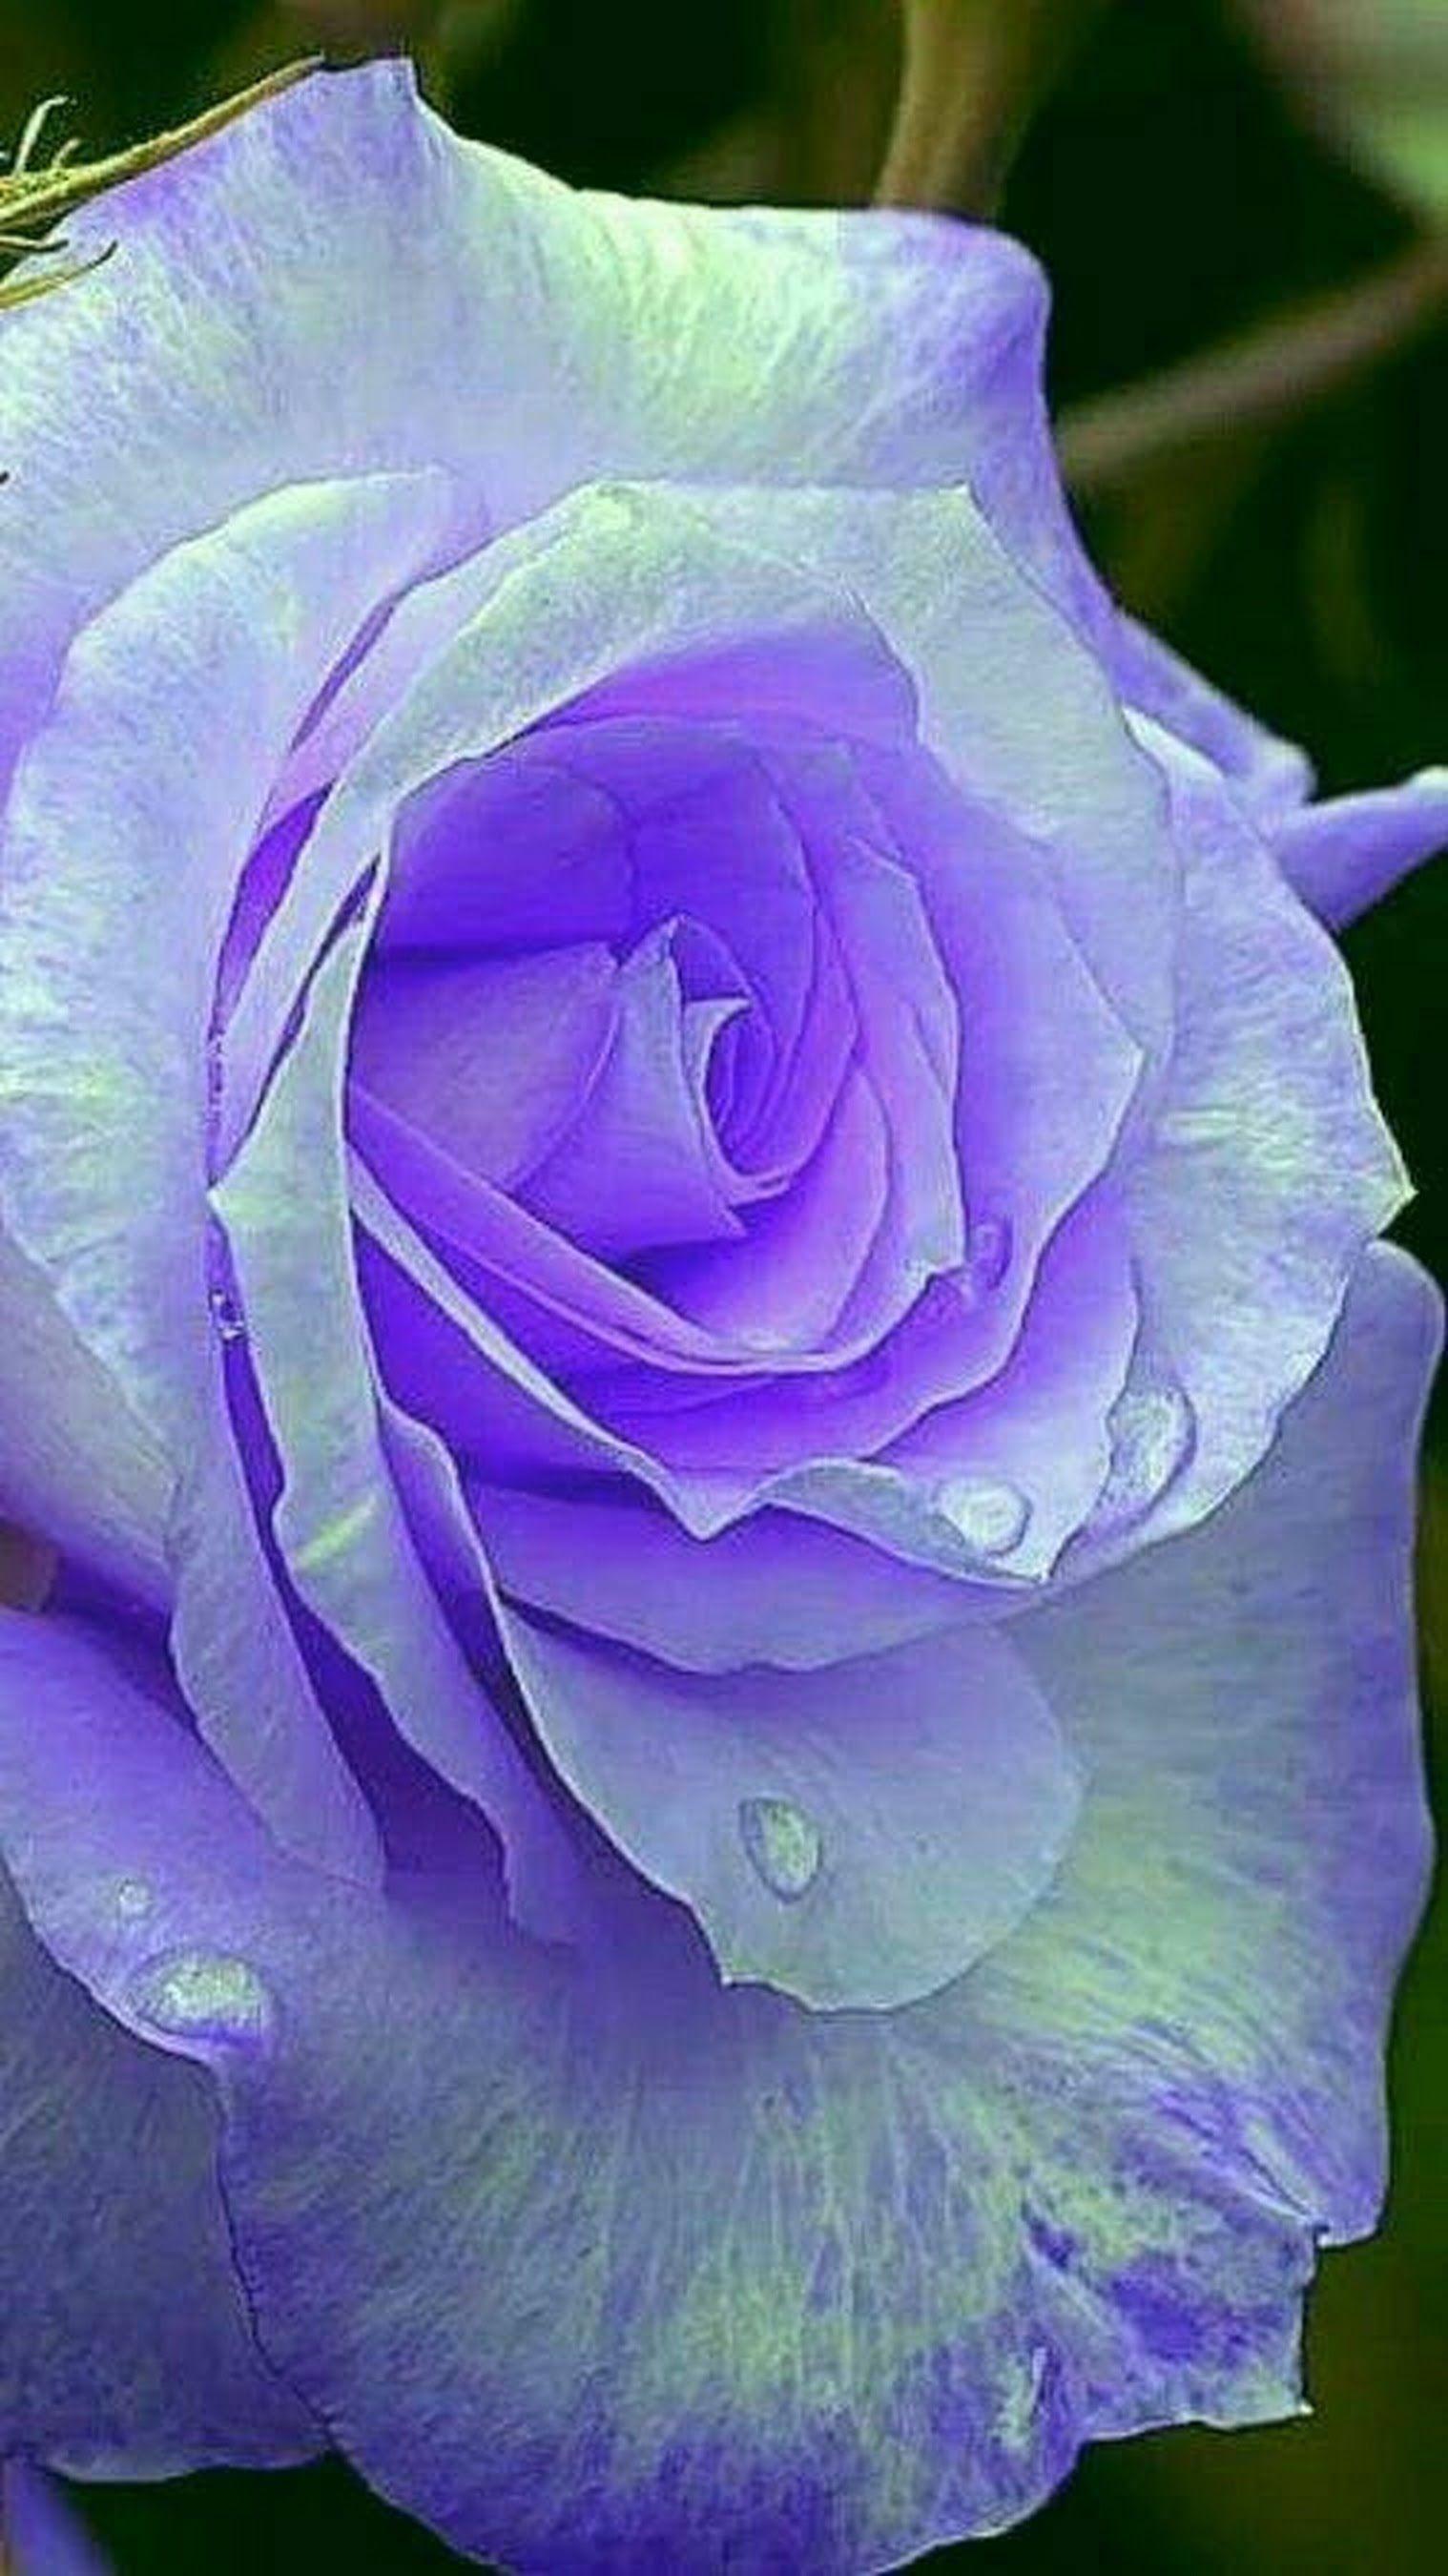 Manohar Reddy Bengaluru India Rare Flowers Purple Flowers Beautiful Roses